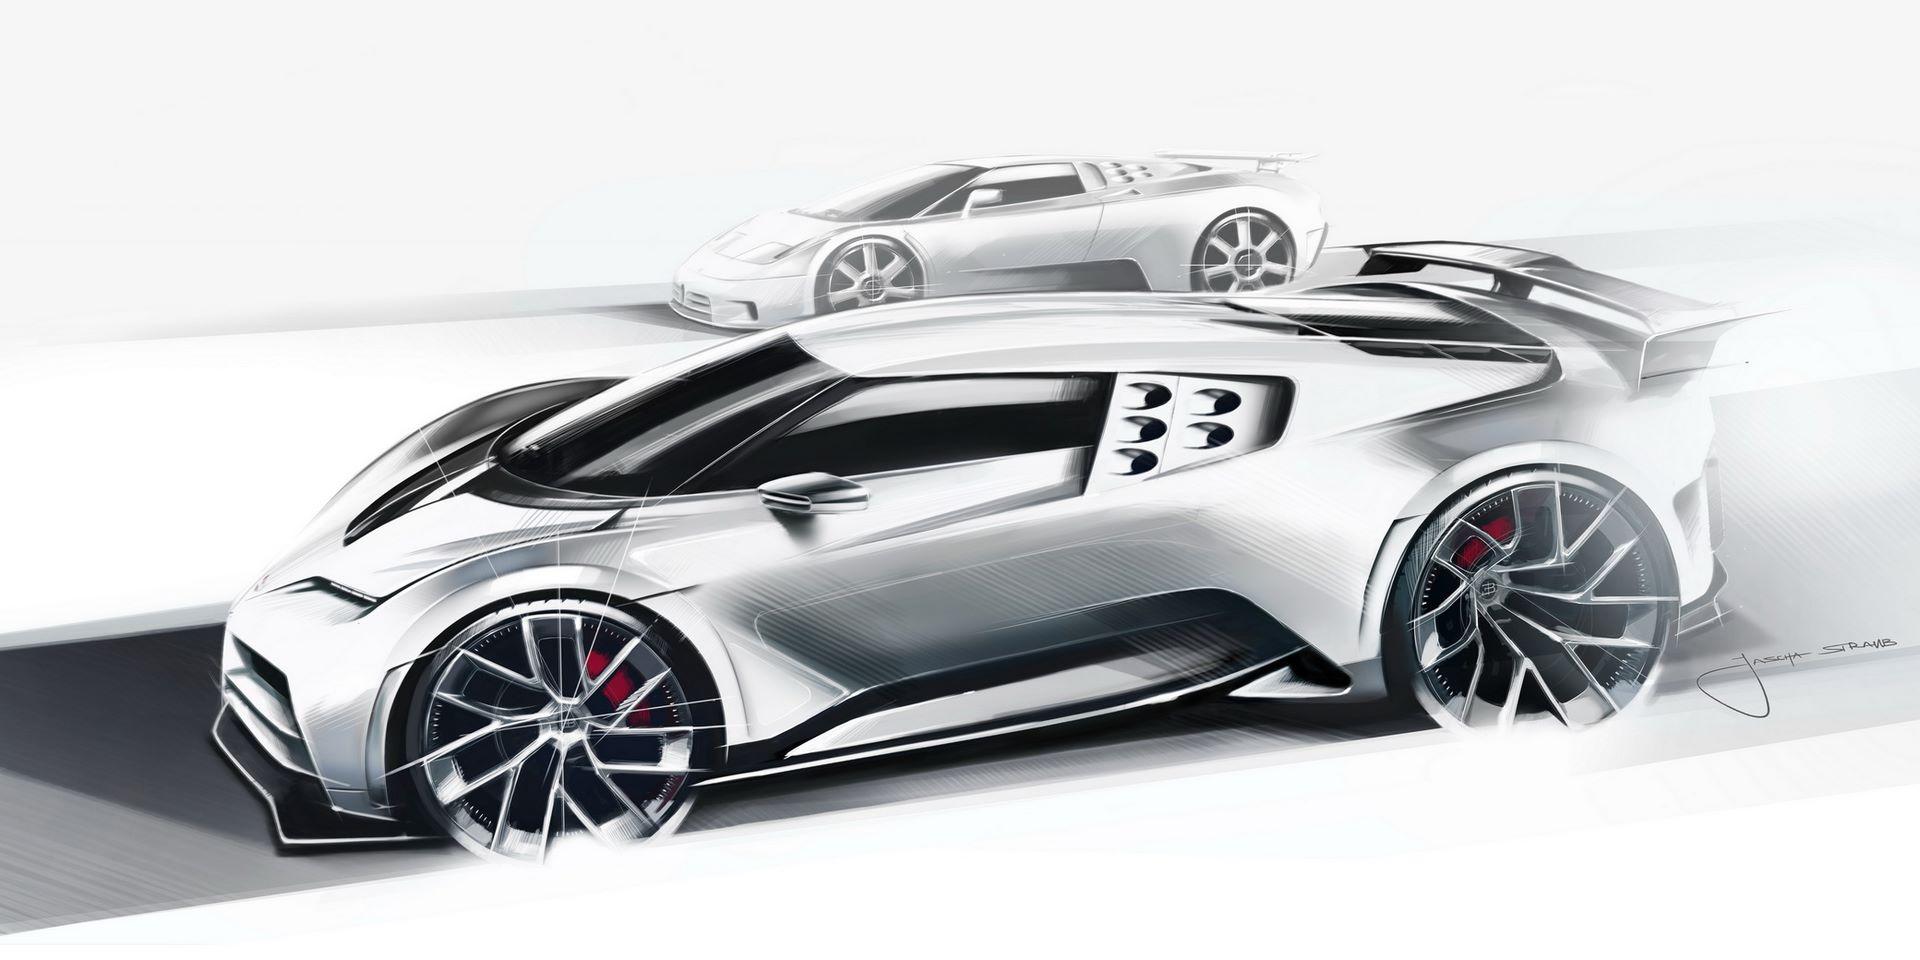 Bugatti-Centodieci-prototype-7